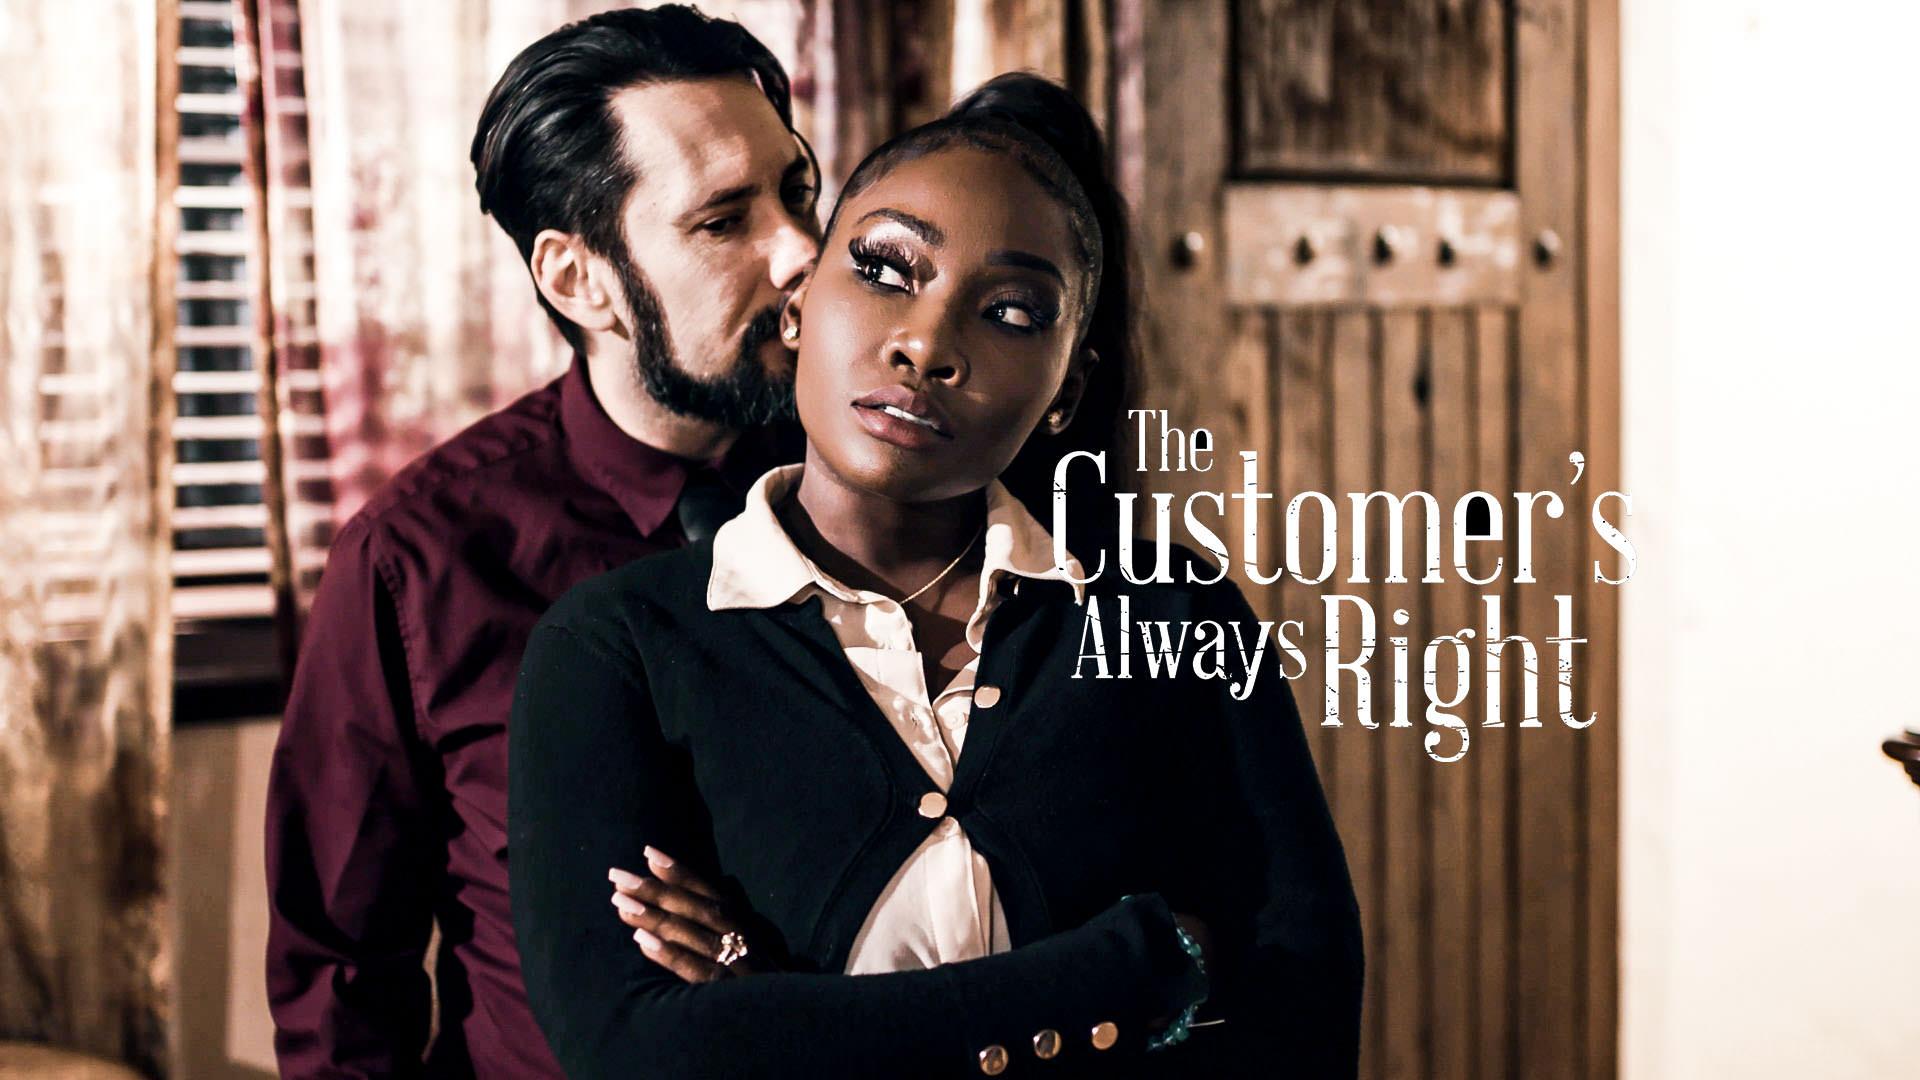 The Customer's Always Right, Scene #01